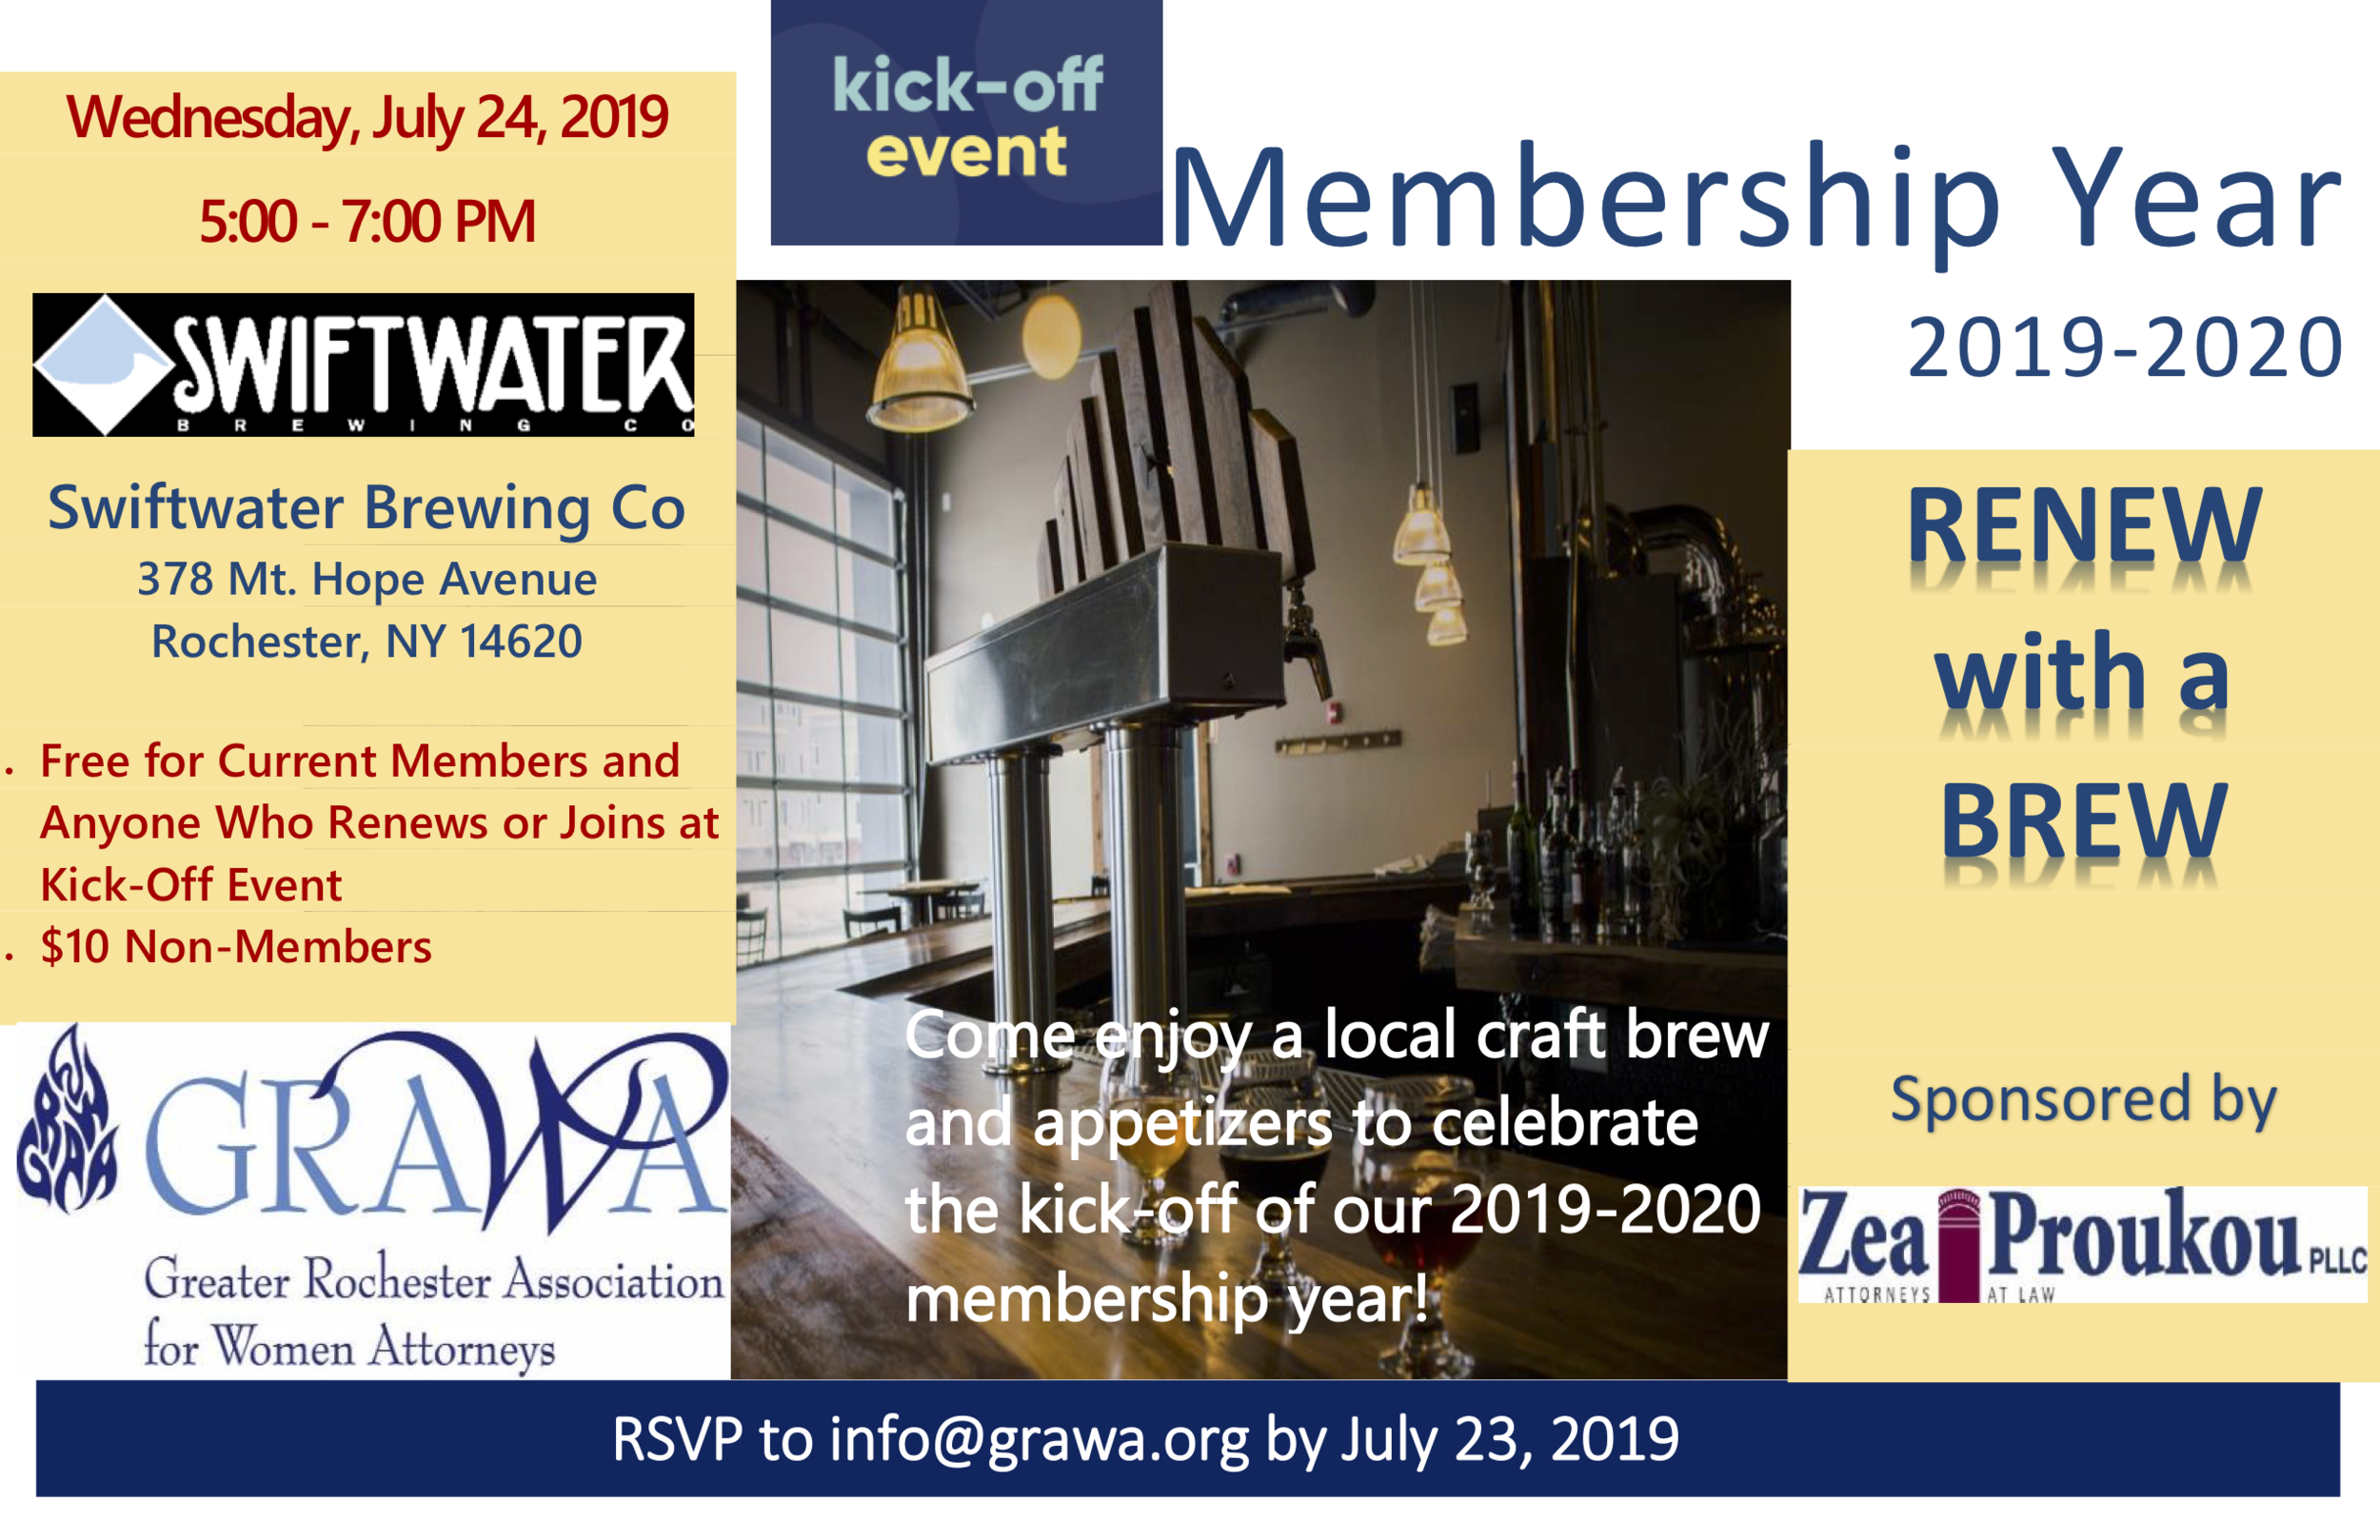 GRAWA Membership Year Kick Off Event (2) July 2019.png